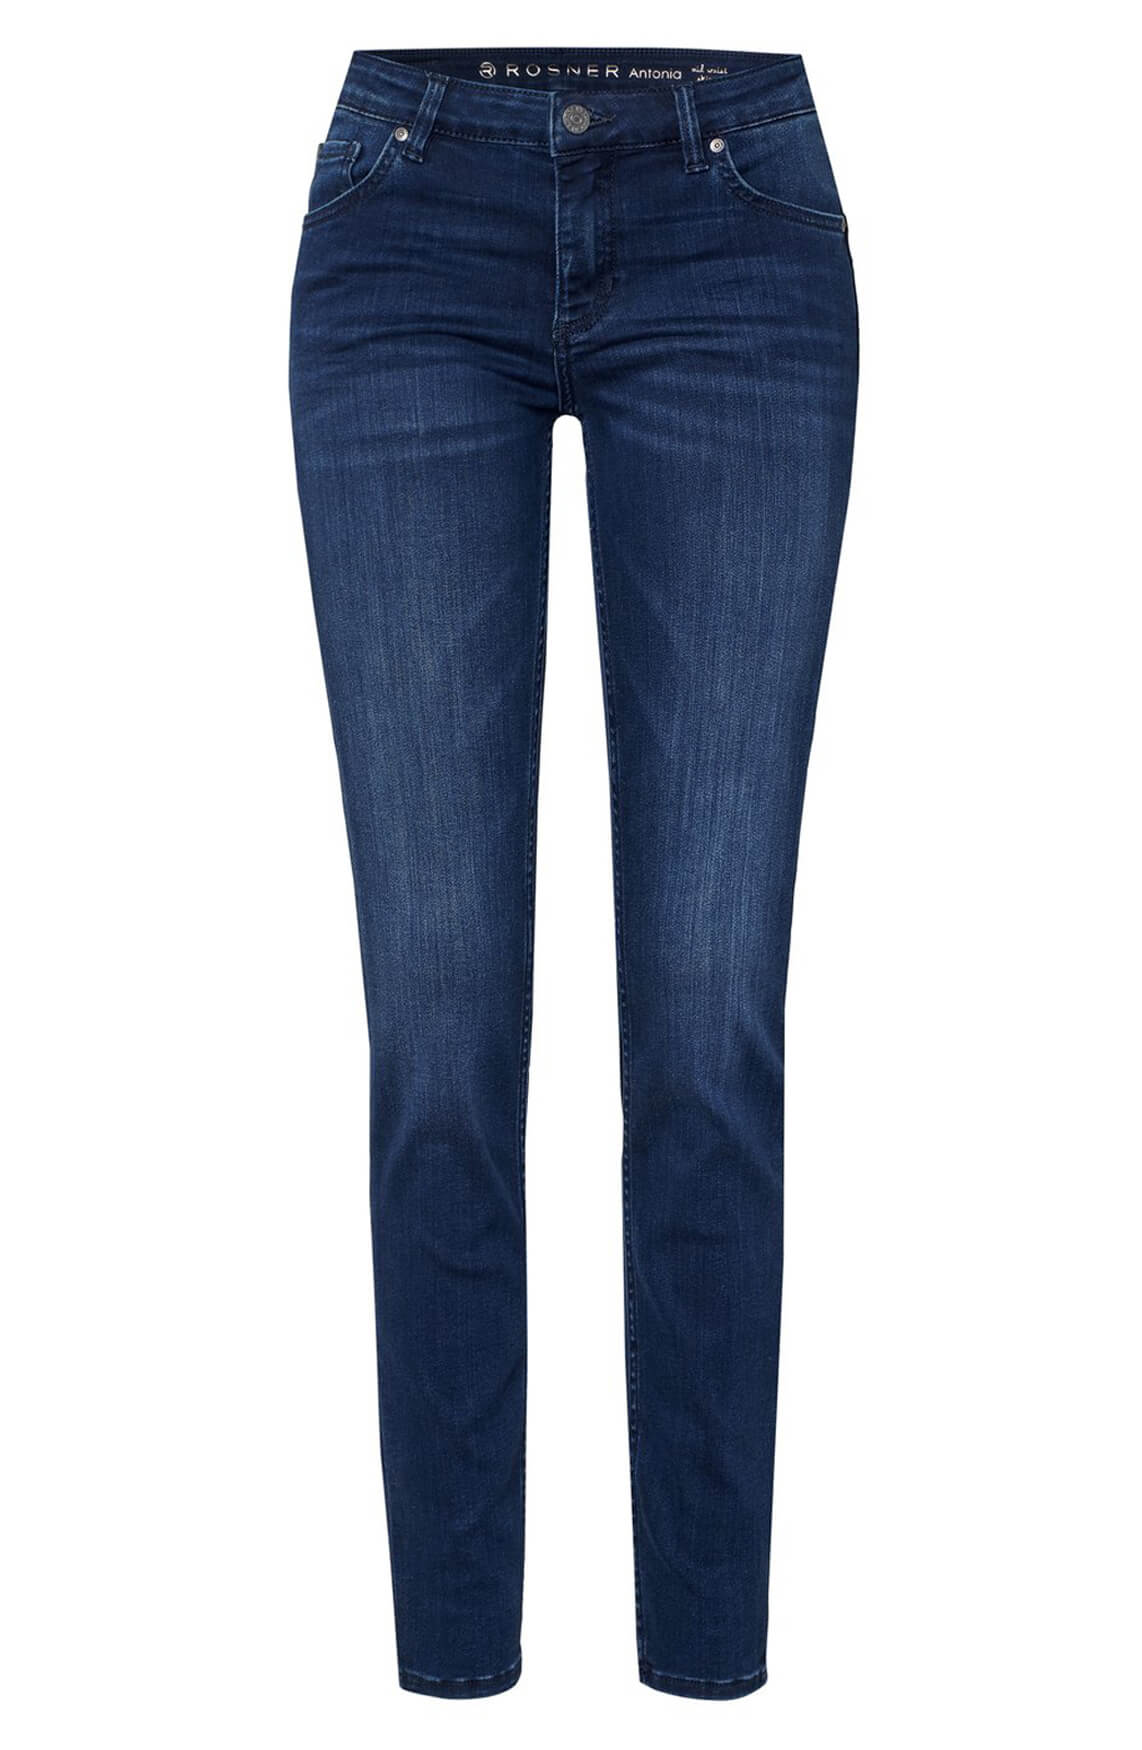 Rosner Dames L32 Antonia mid-waist jeans Blauw